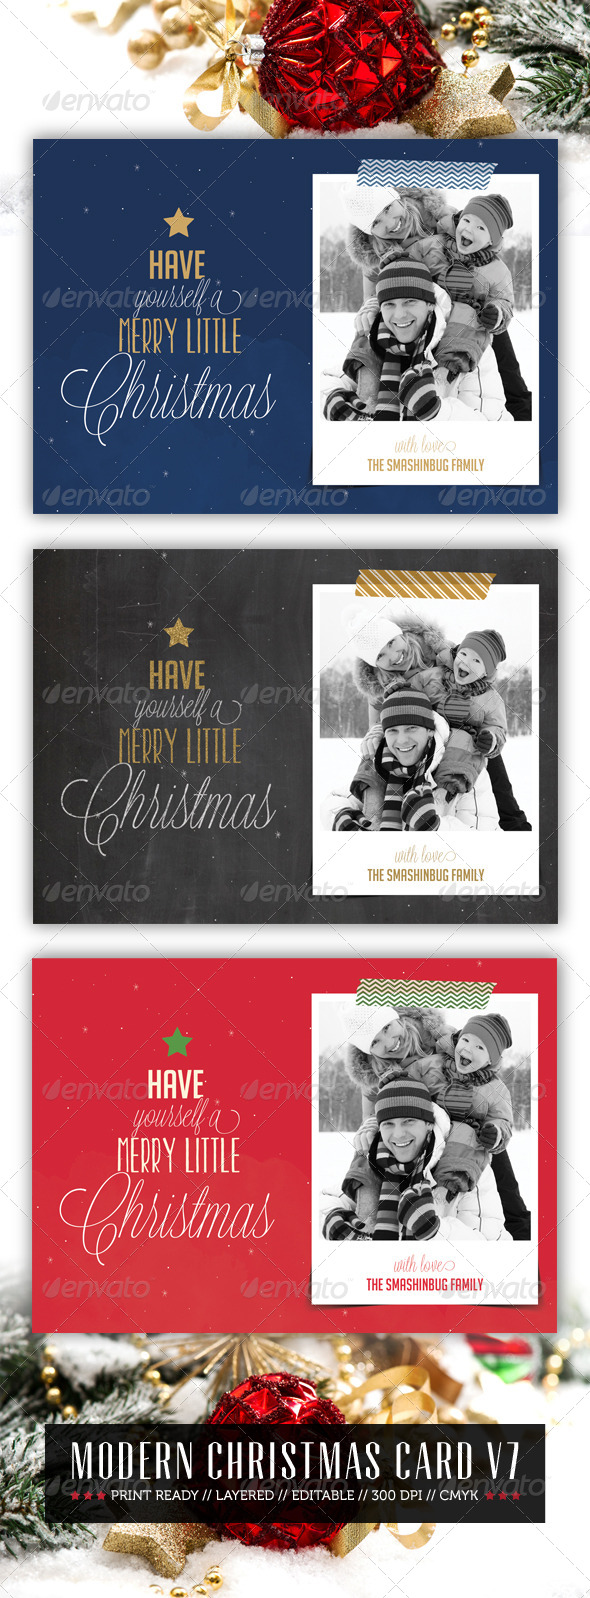 Modern Christmas Card V7  - Holiday Greeting Cards